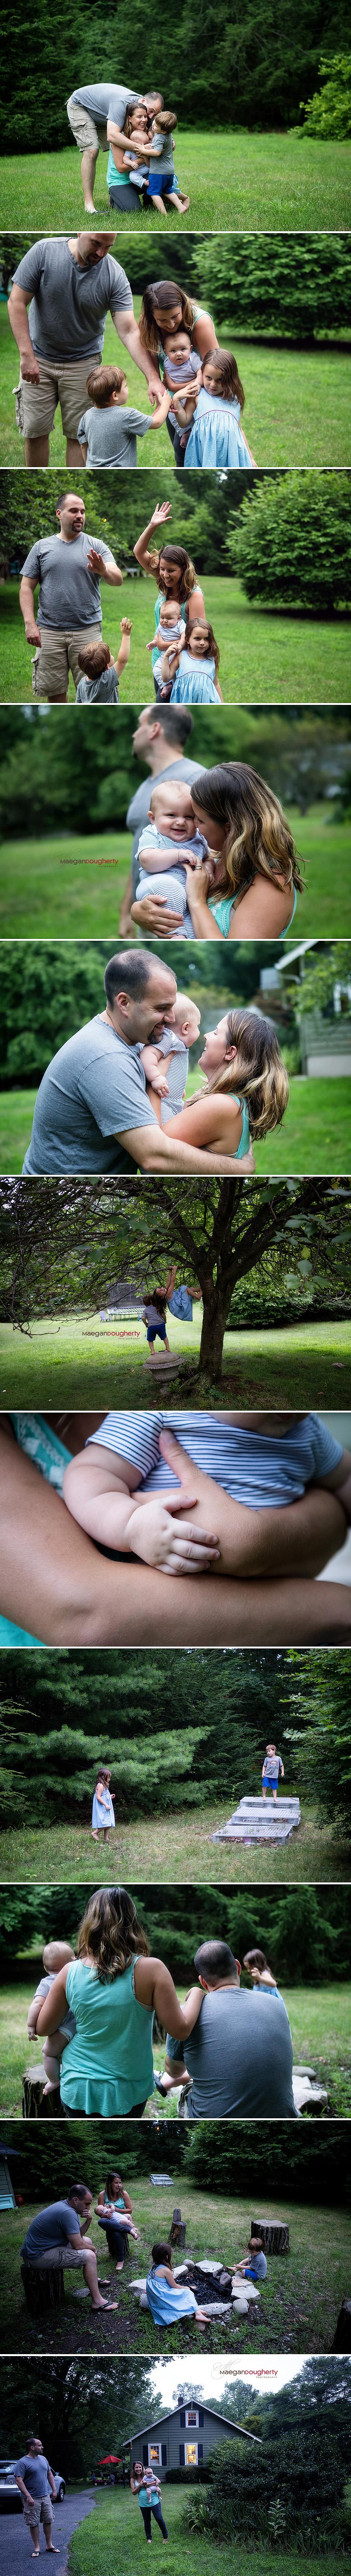 bergen county nj family photographer